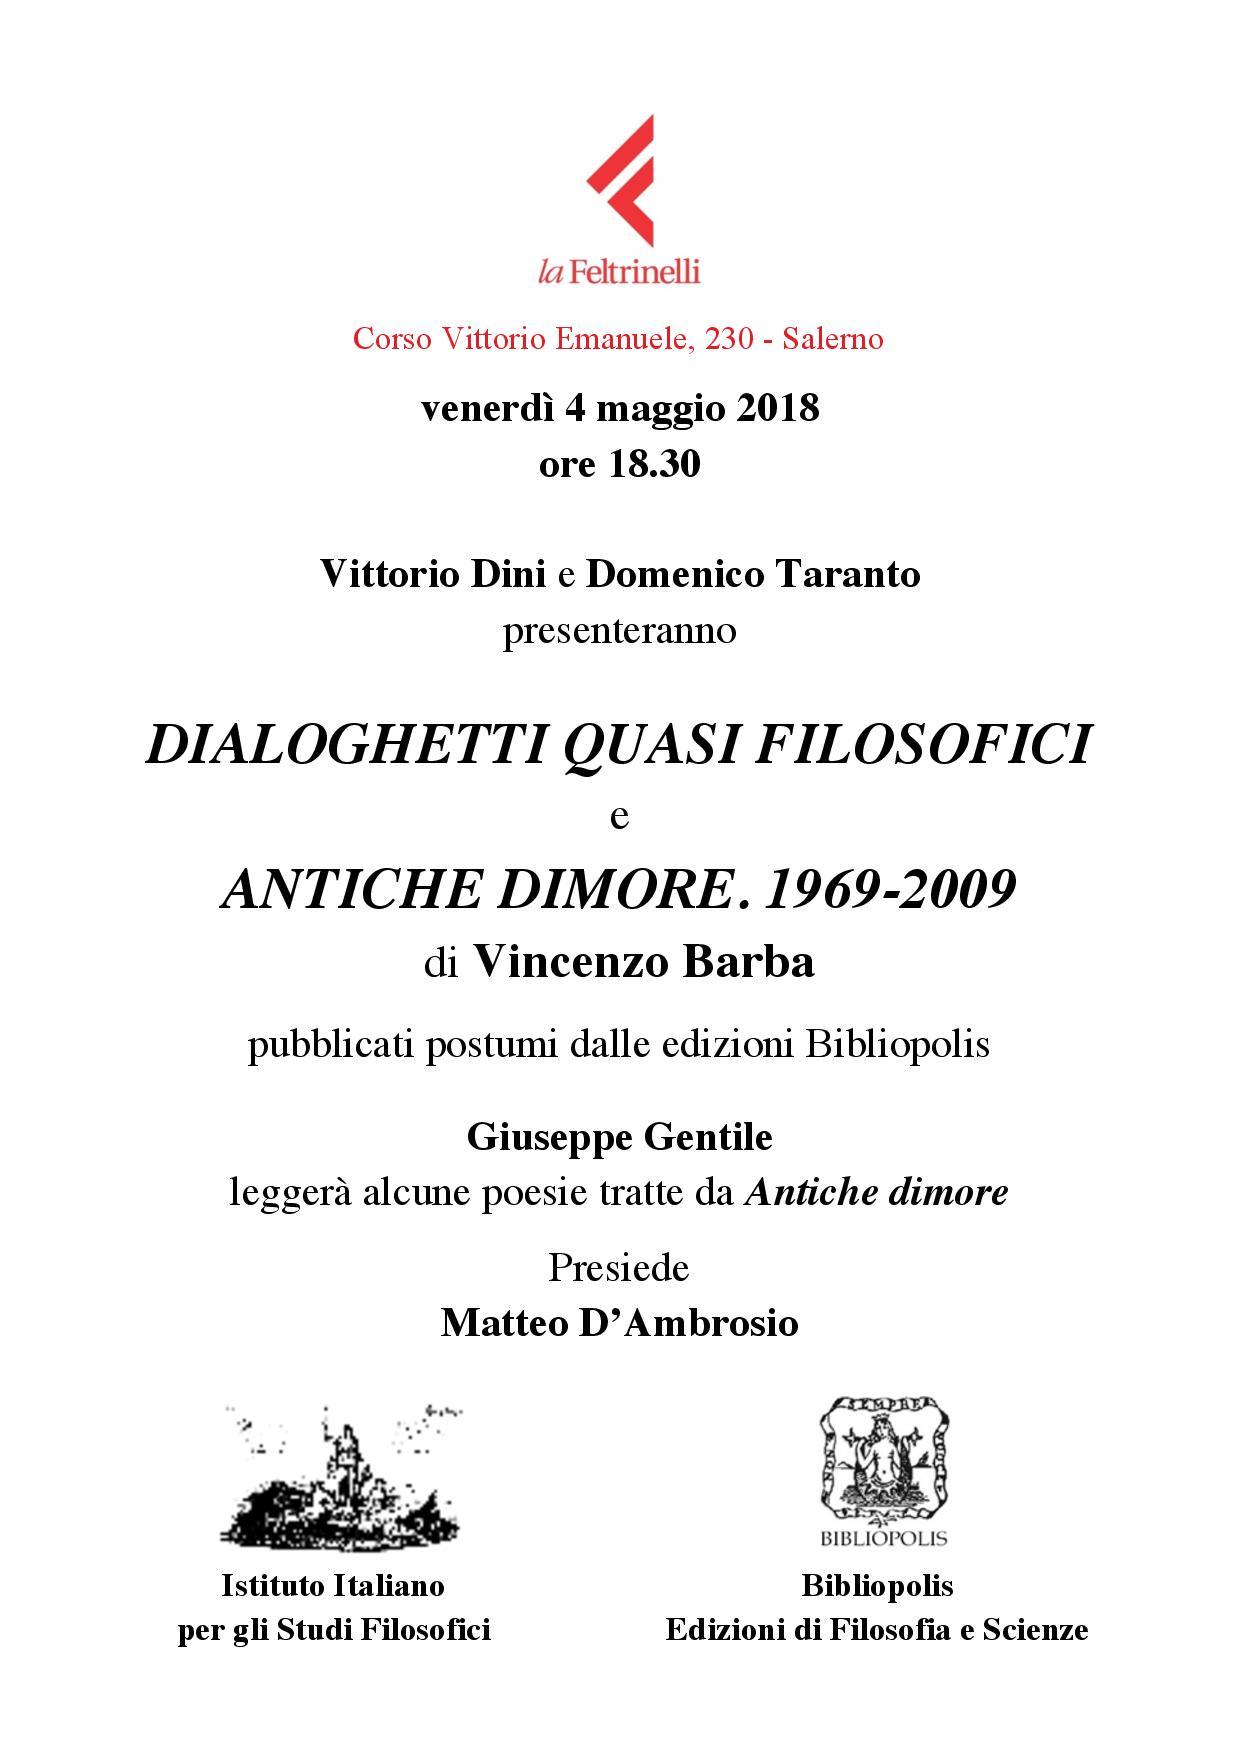 locandina-feltrinelli-sa-_mod1-page-001